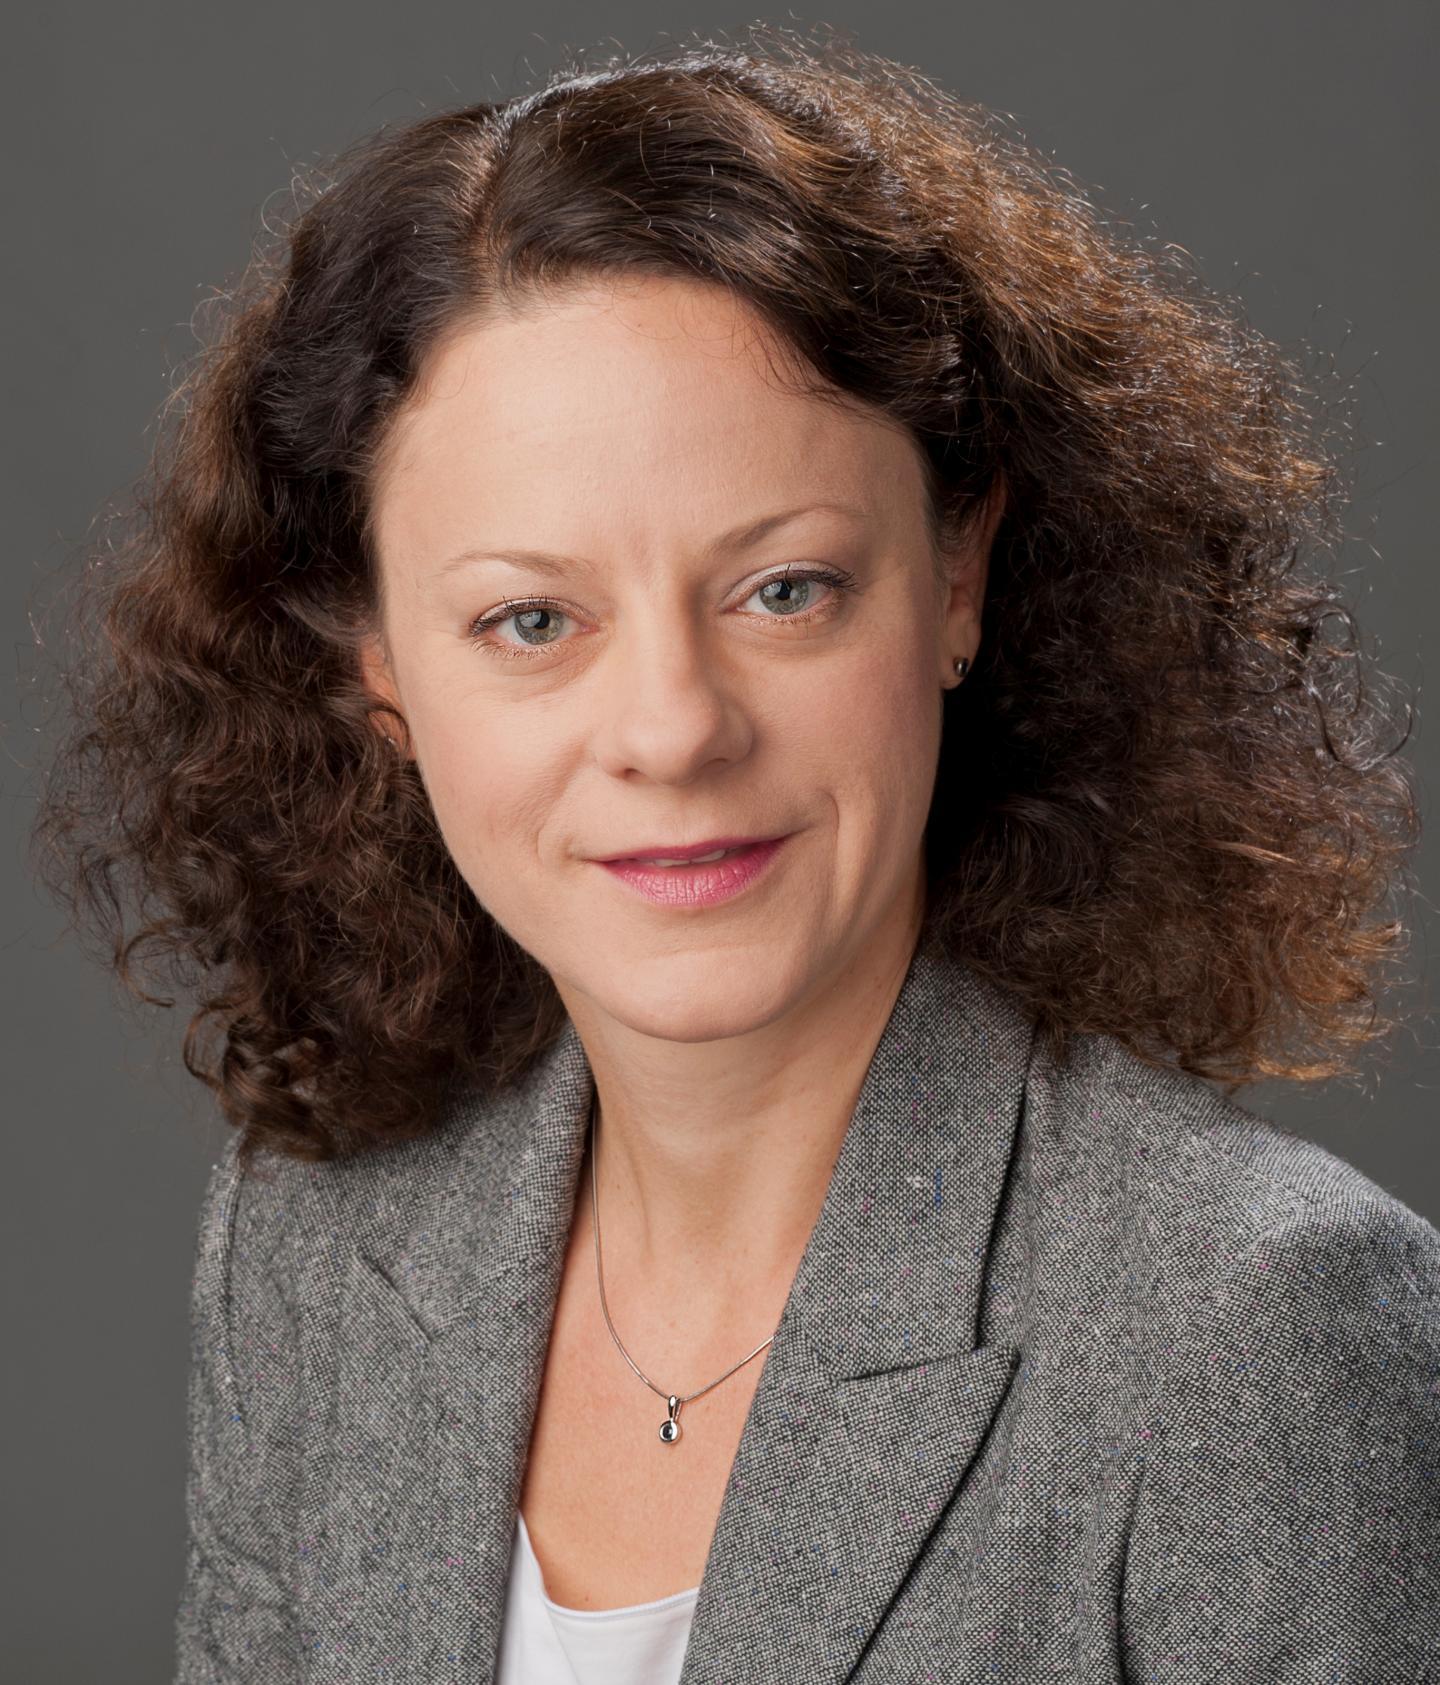 Sigrid Elsenbruch, United European Gastroenterology